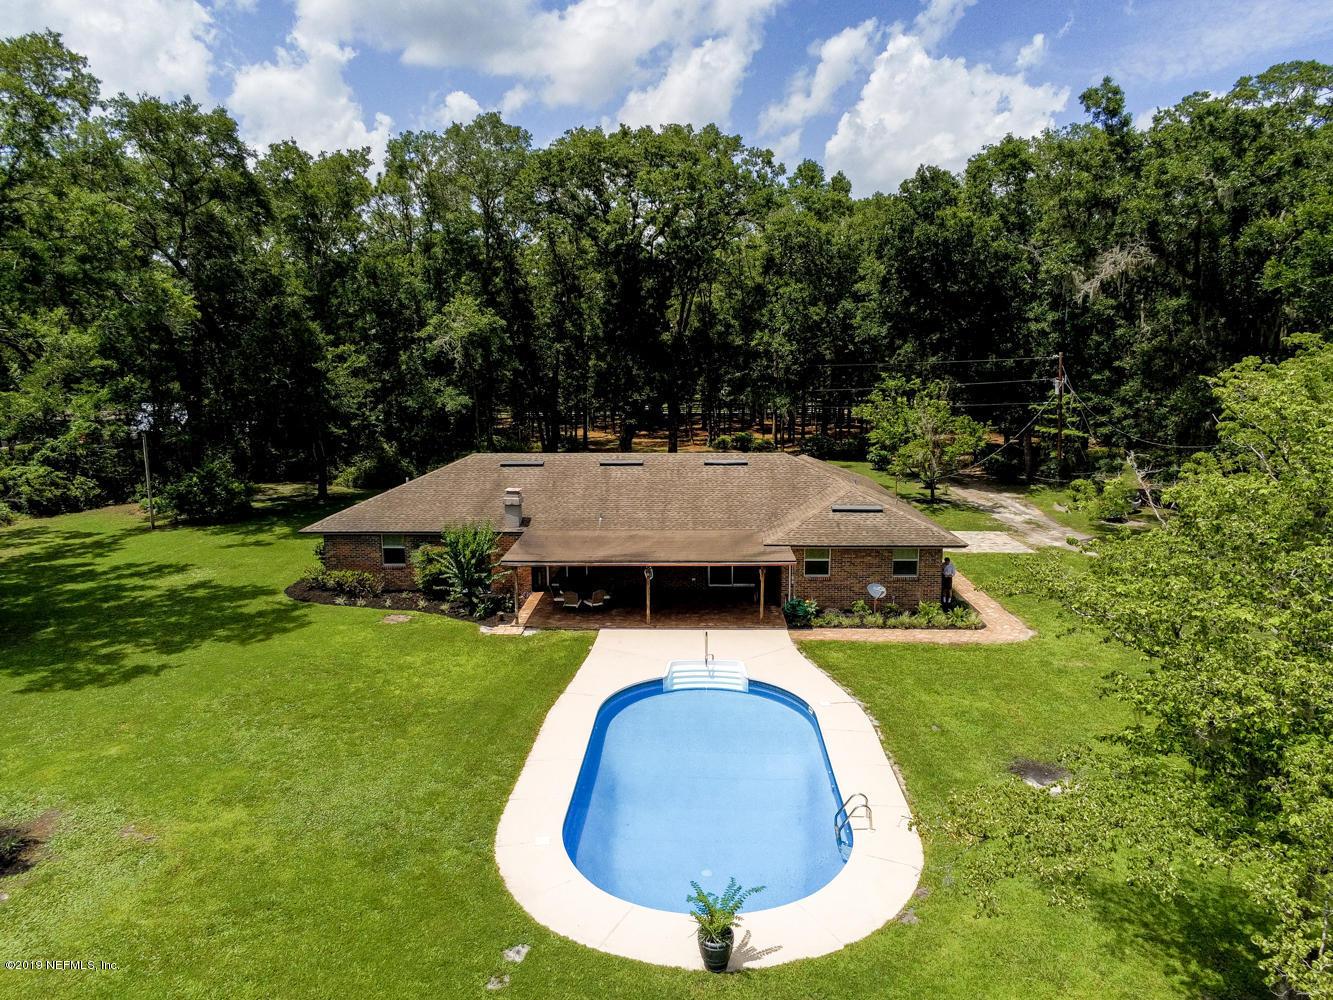 849 BRANSCOMB, GREEN COVE SPRINGS, FLORIDA 32043, 4 Bedrooms Bedrooms, ,2 BathroomsBathrooms,Residential - single family,For sale,BRANSCOMB,1001848